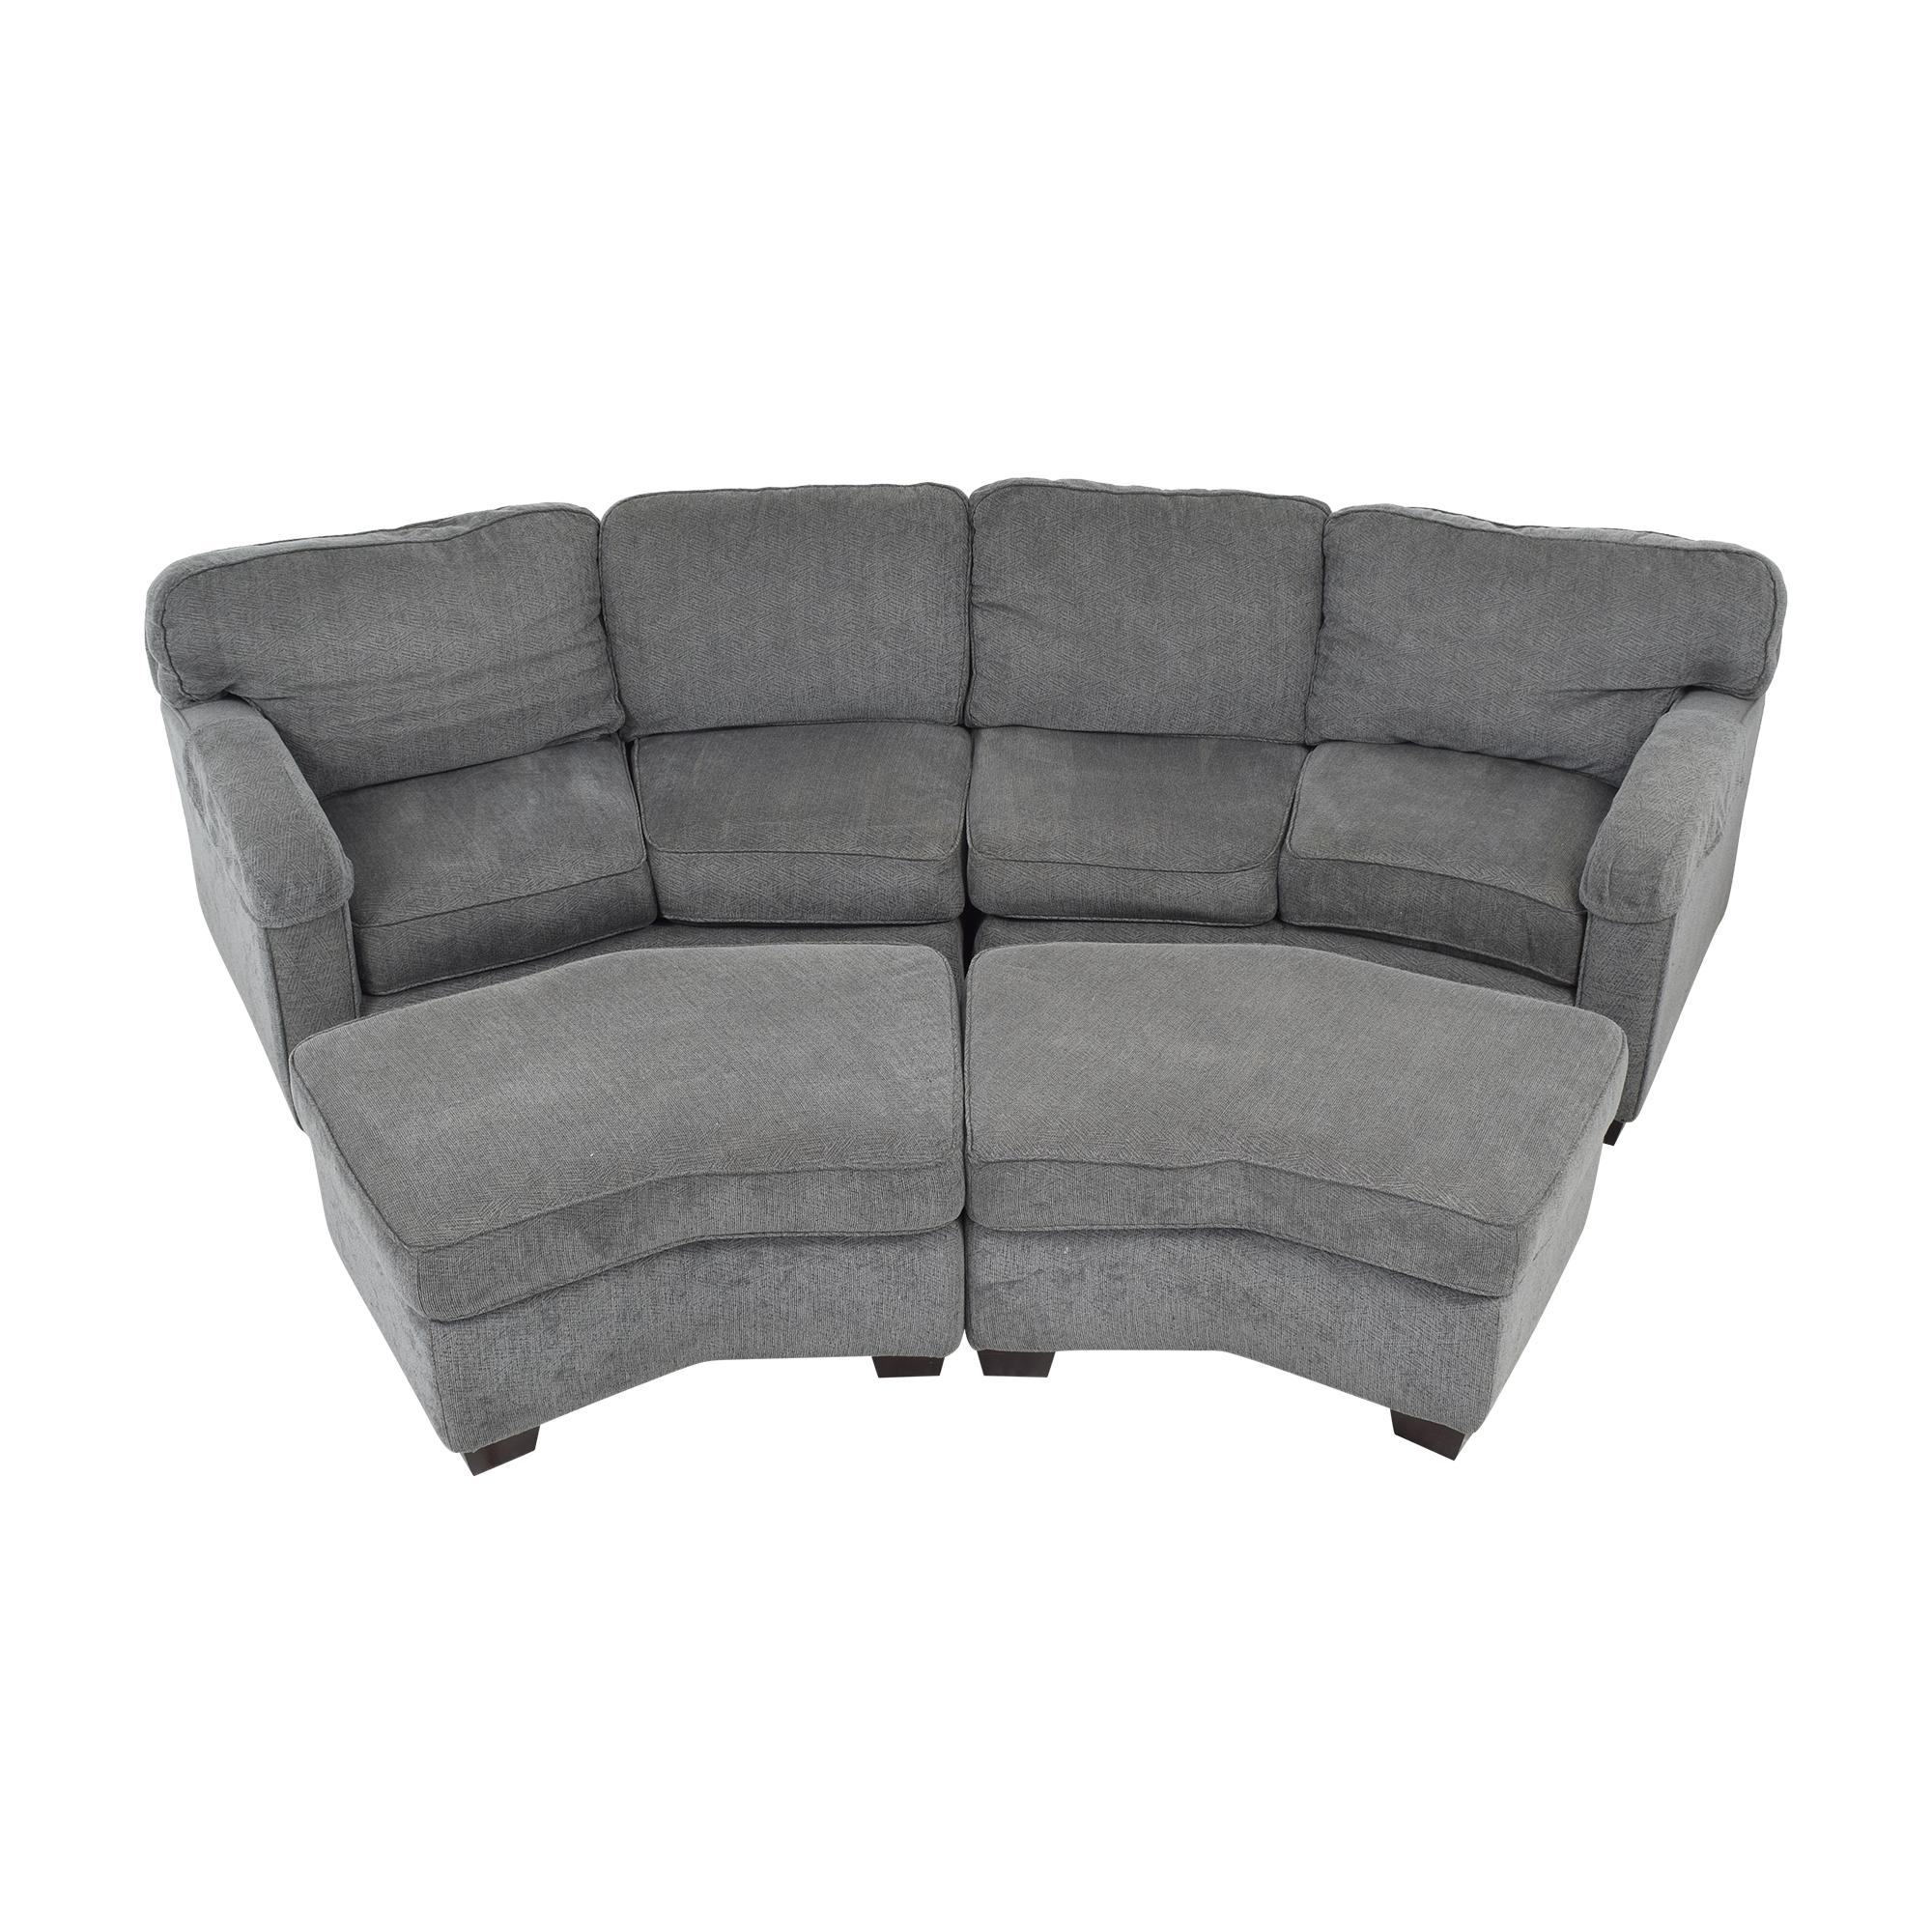 Bassett Furniture Bassett Furniture Sectional Sofa with Ottomans price